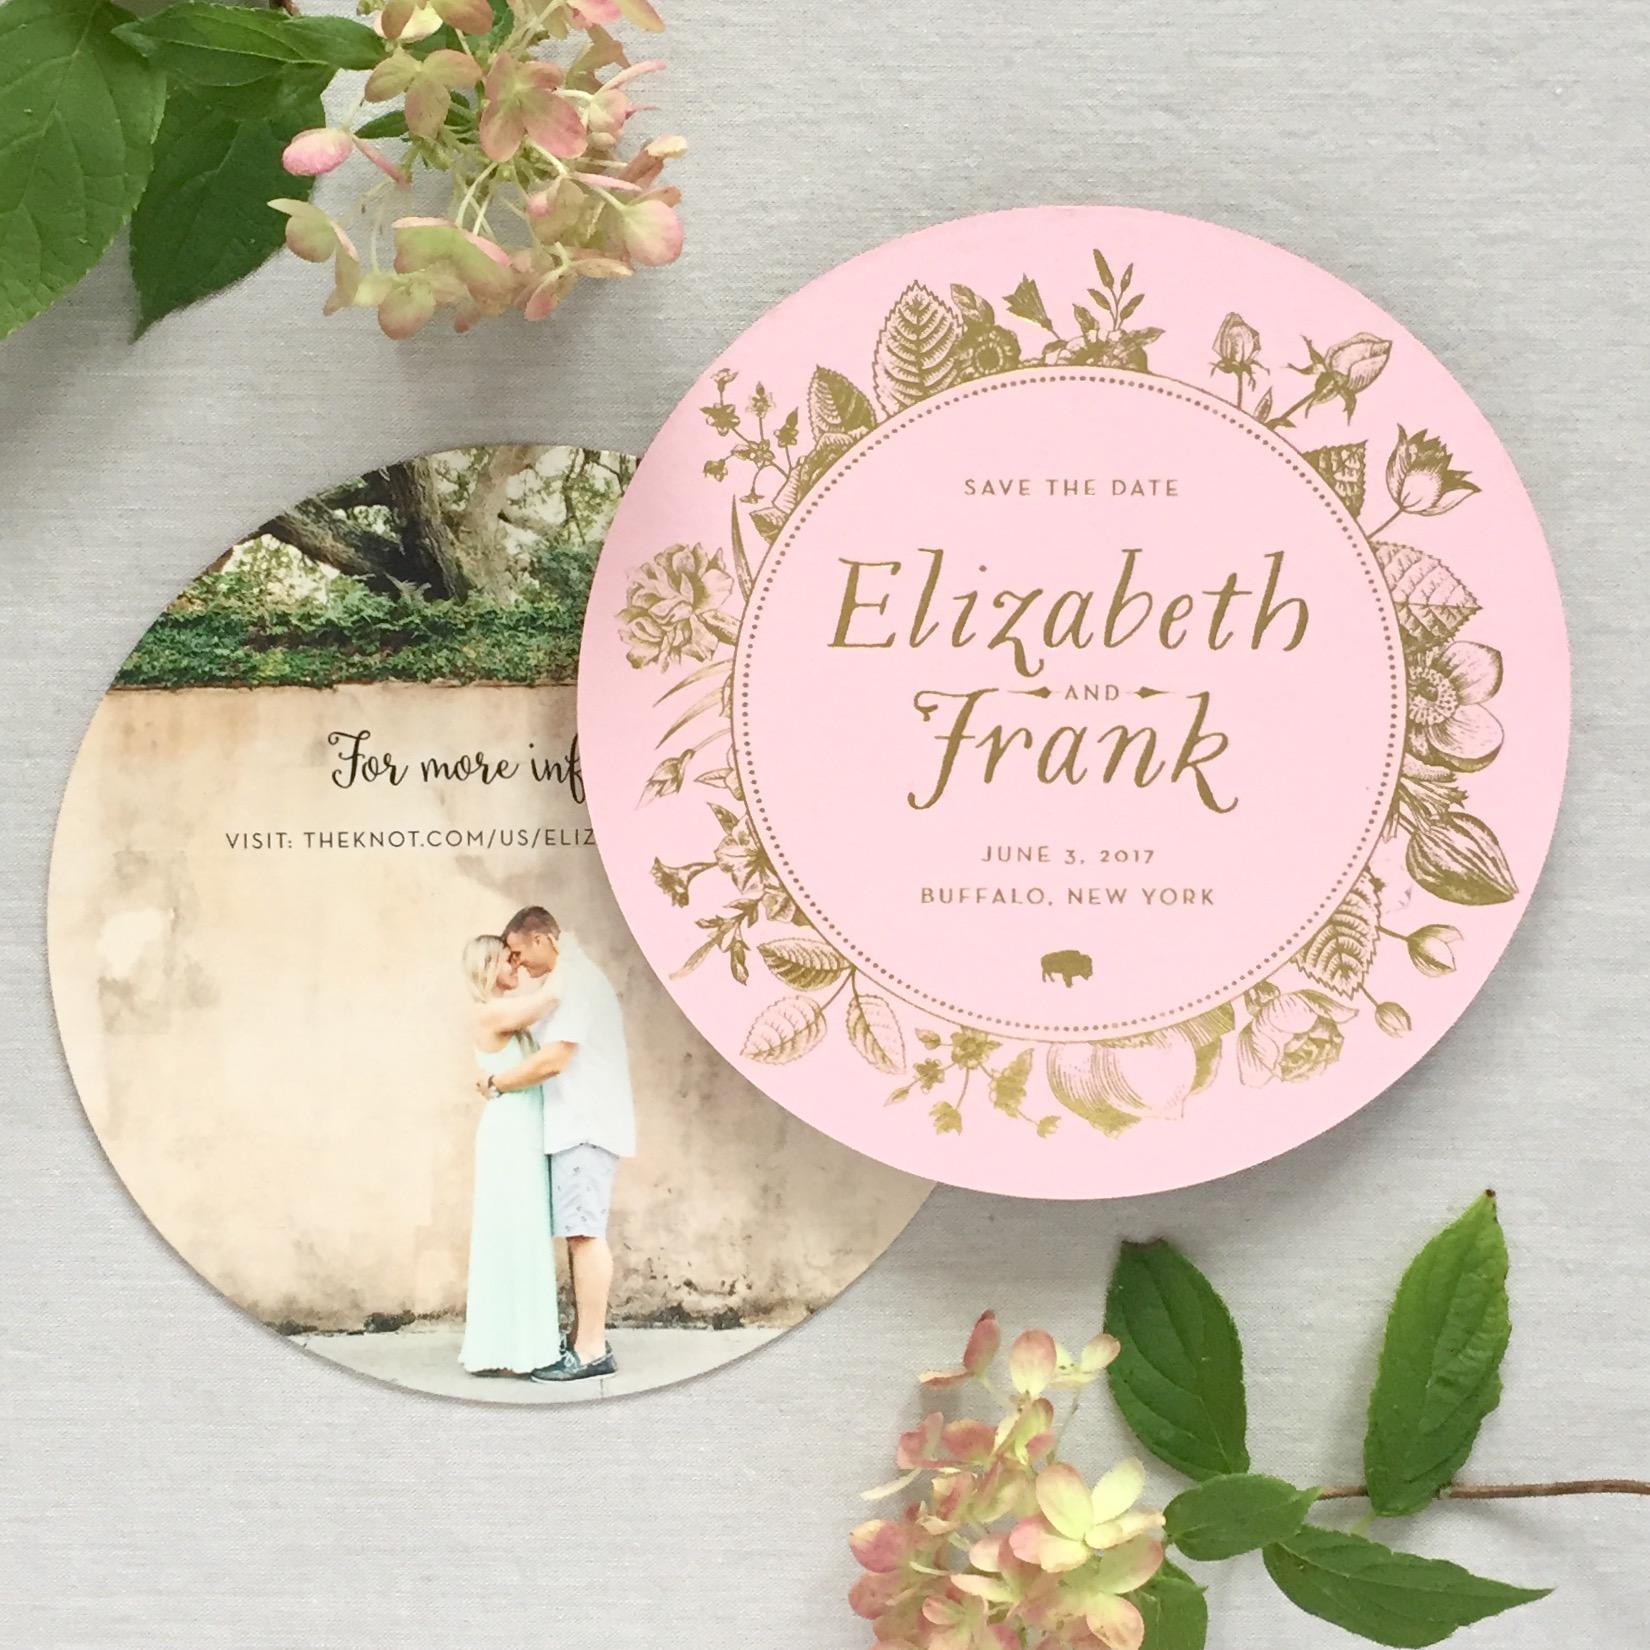 Maria_Bond_Design_Buffalo_Botanical_Wedding_Invite.jpg